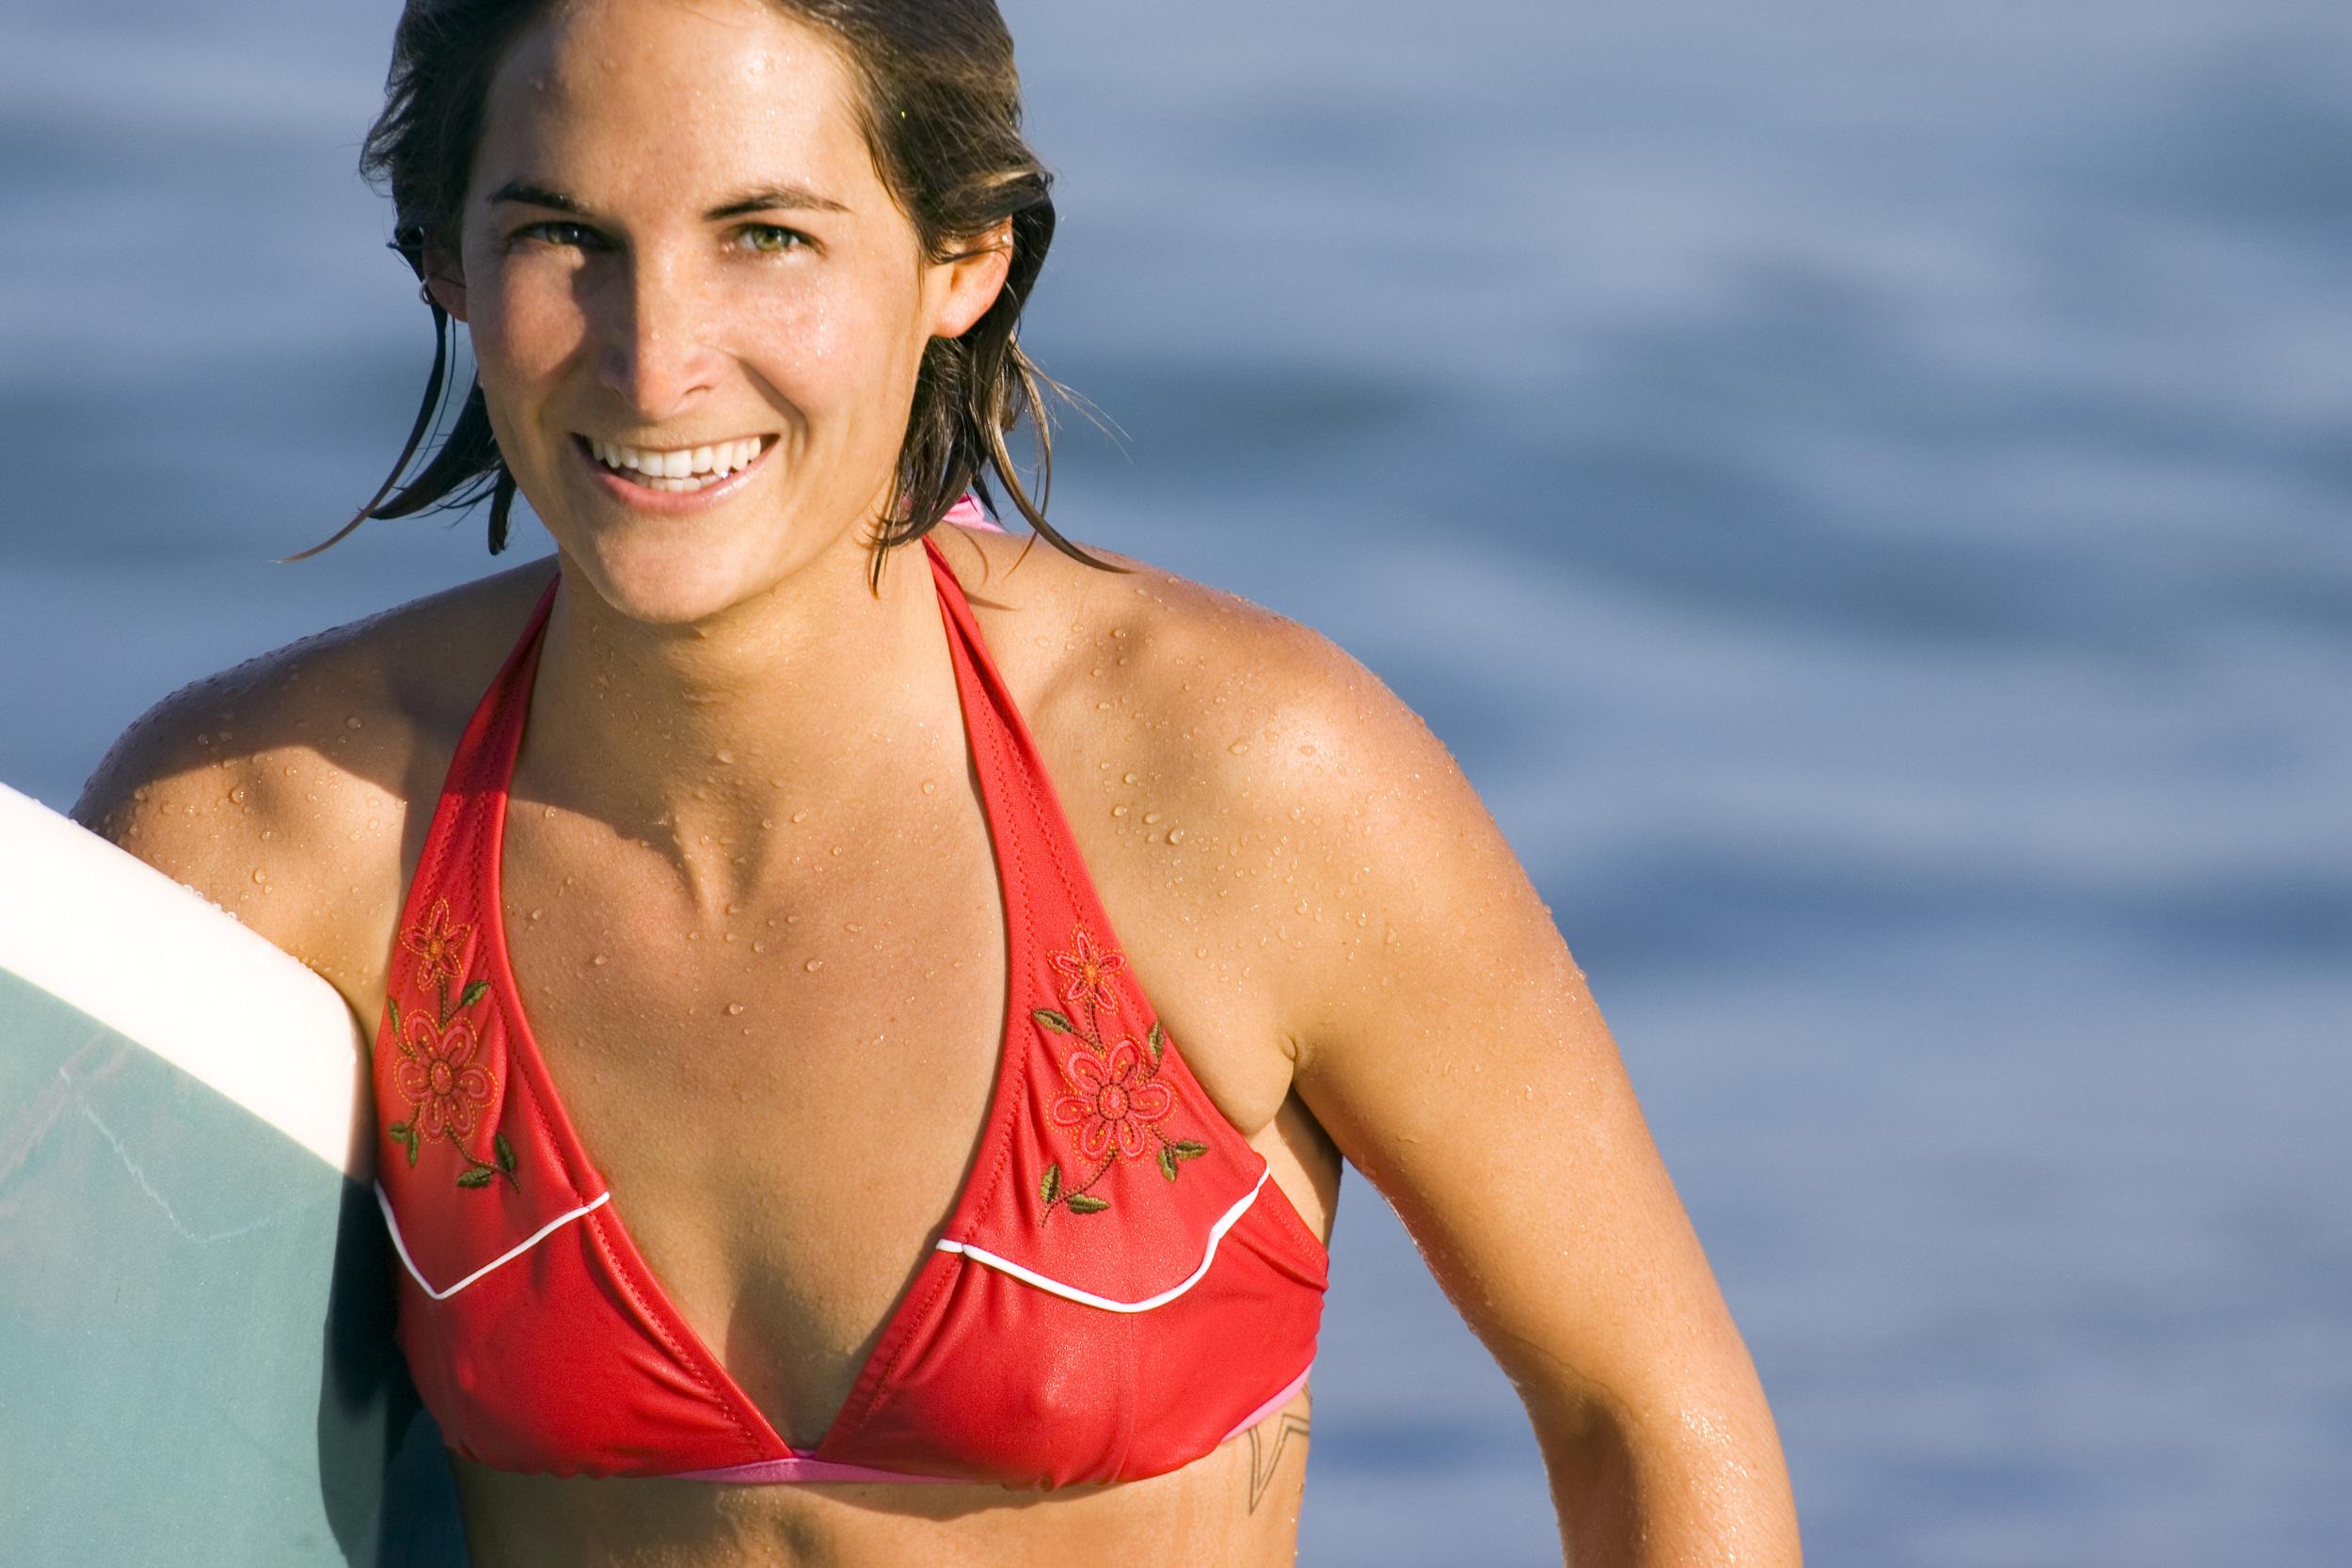 Julie on the cover of the Athleta catalog 2006. Photo: Lori Adamski-Peak